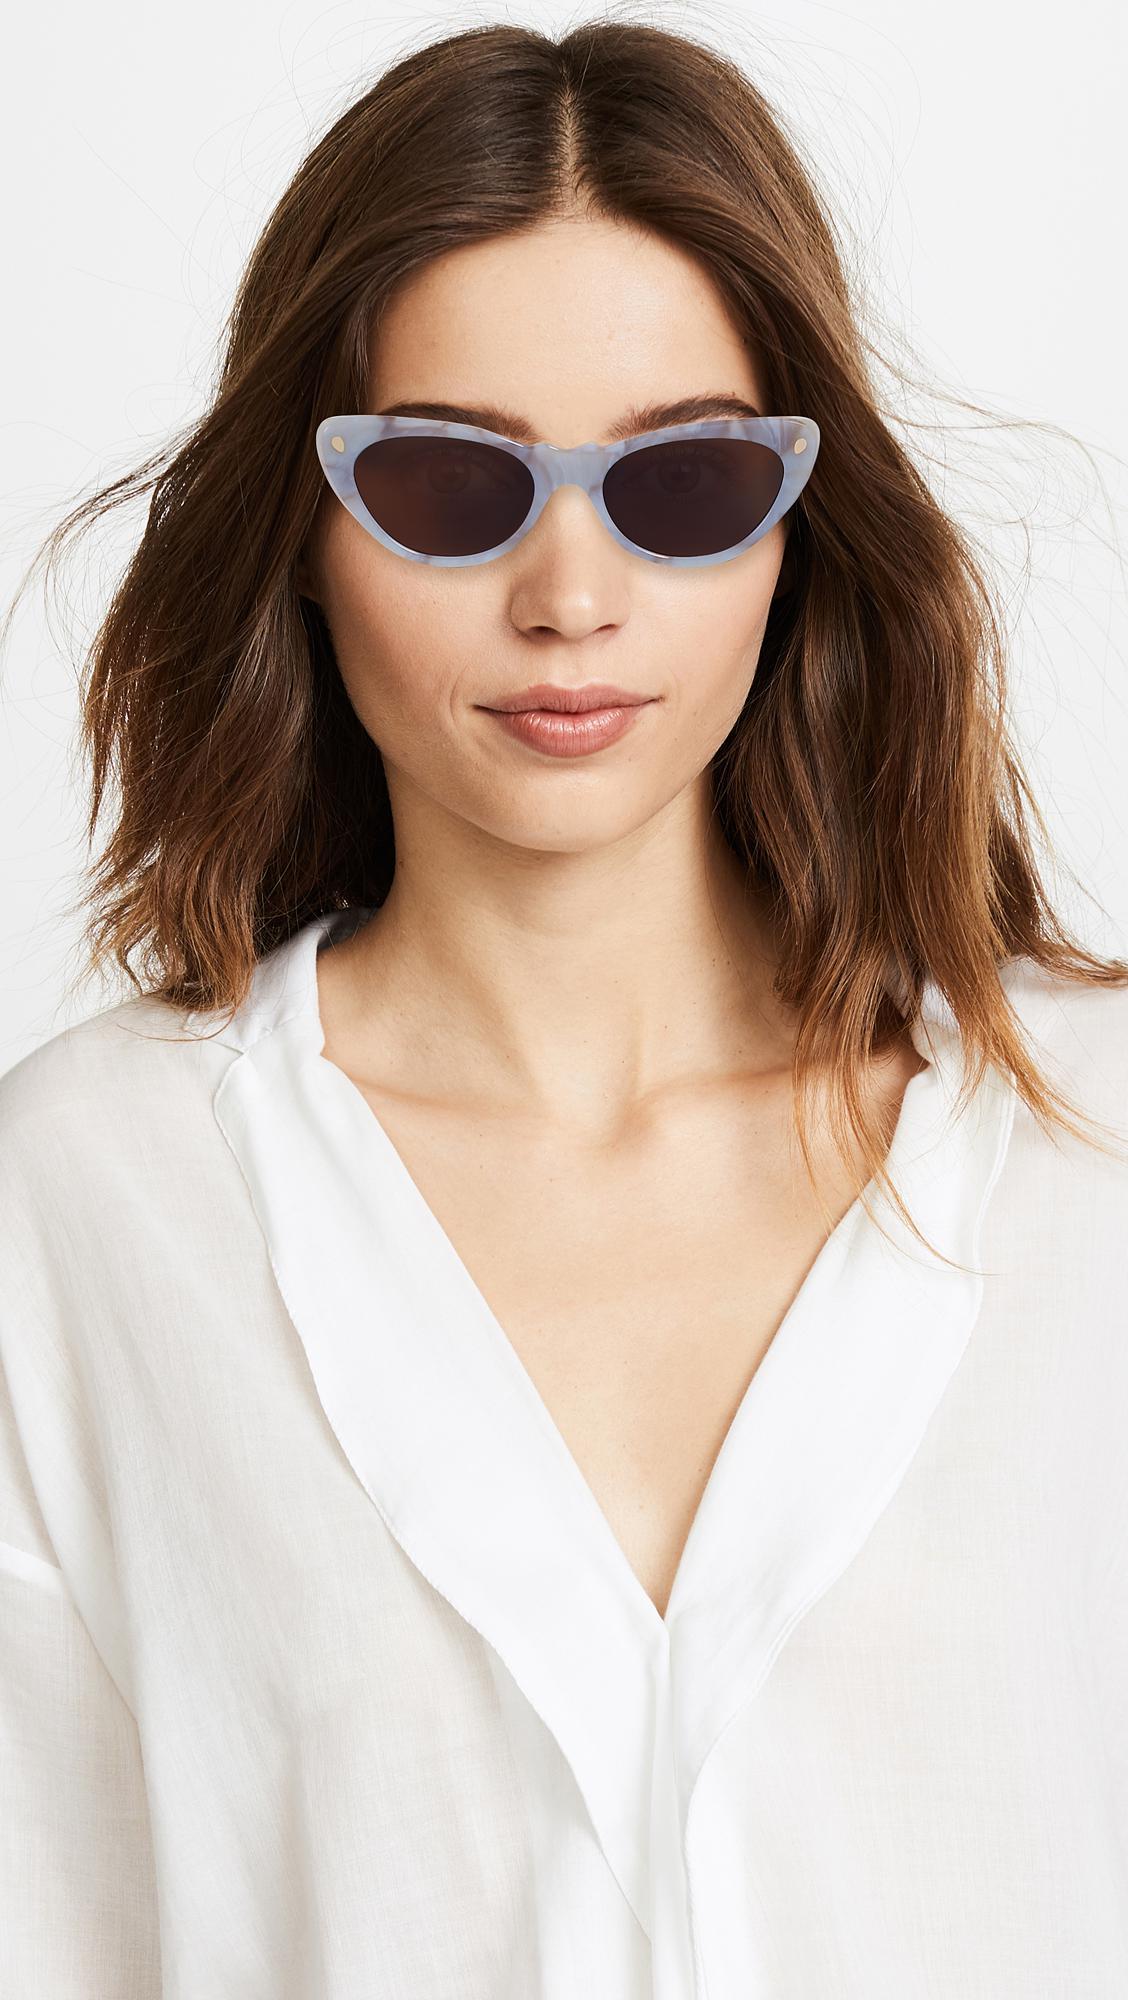 e45dfd3a0a Lyst - Lucy Folk Slice Of Heaven Sunglasses - Save 48%